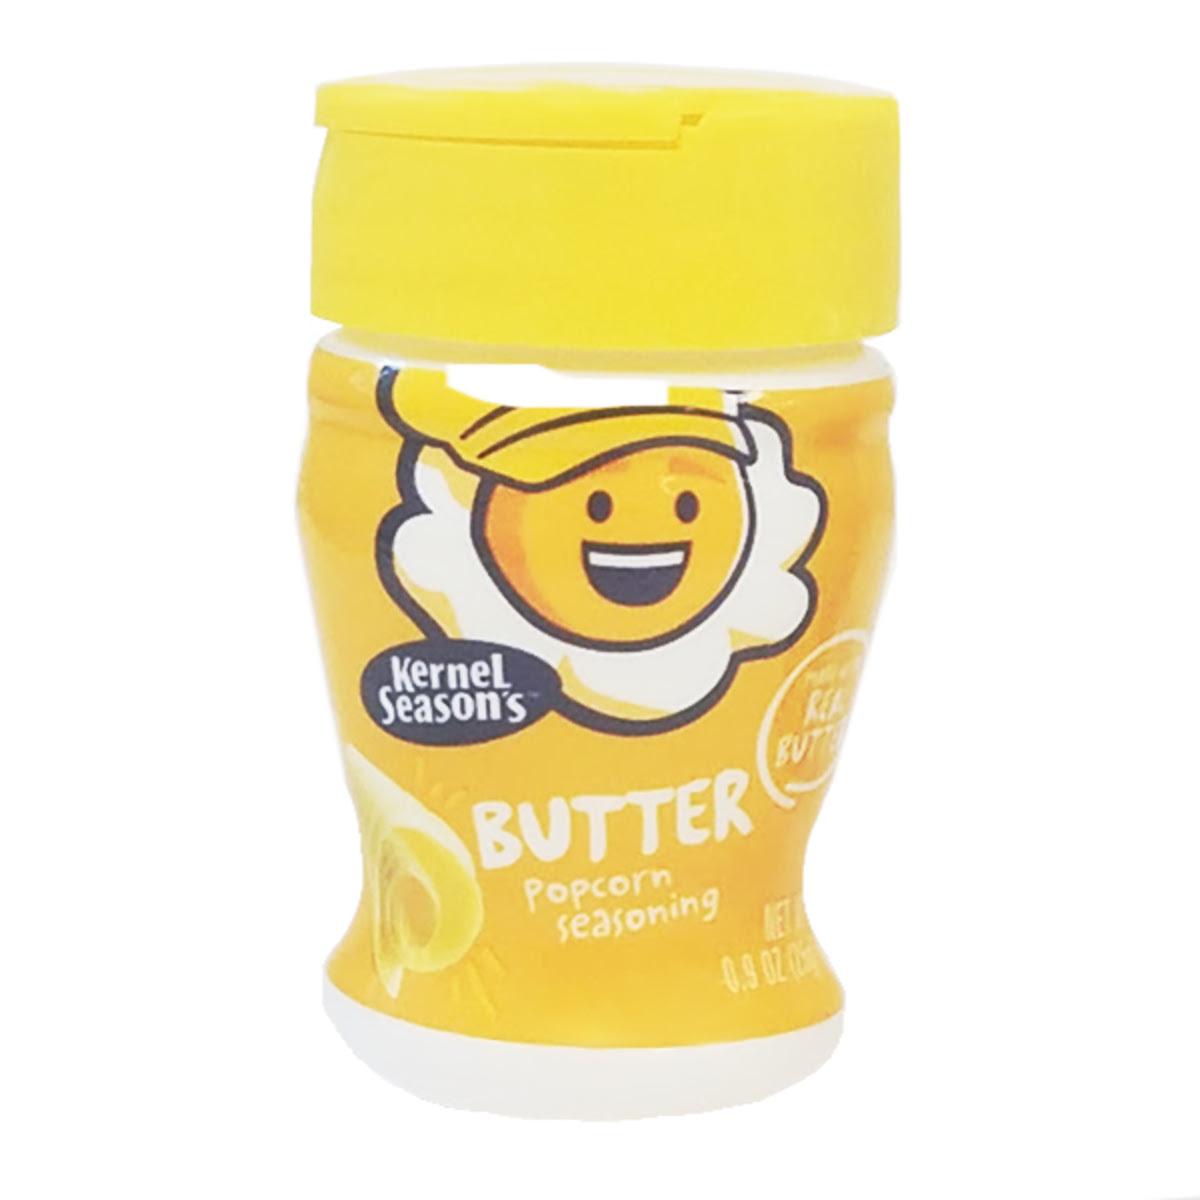 Wholesale Kernel Season S Popcorn Seasoning Butter 0 9 Oz Sku 746183 Dollardays